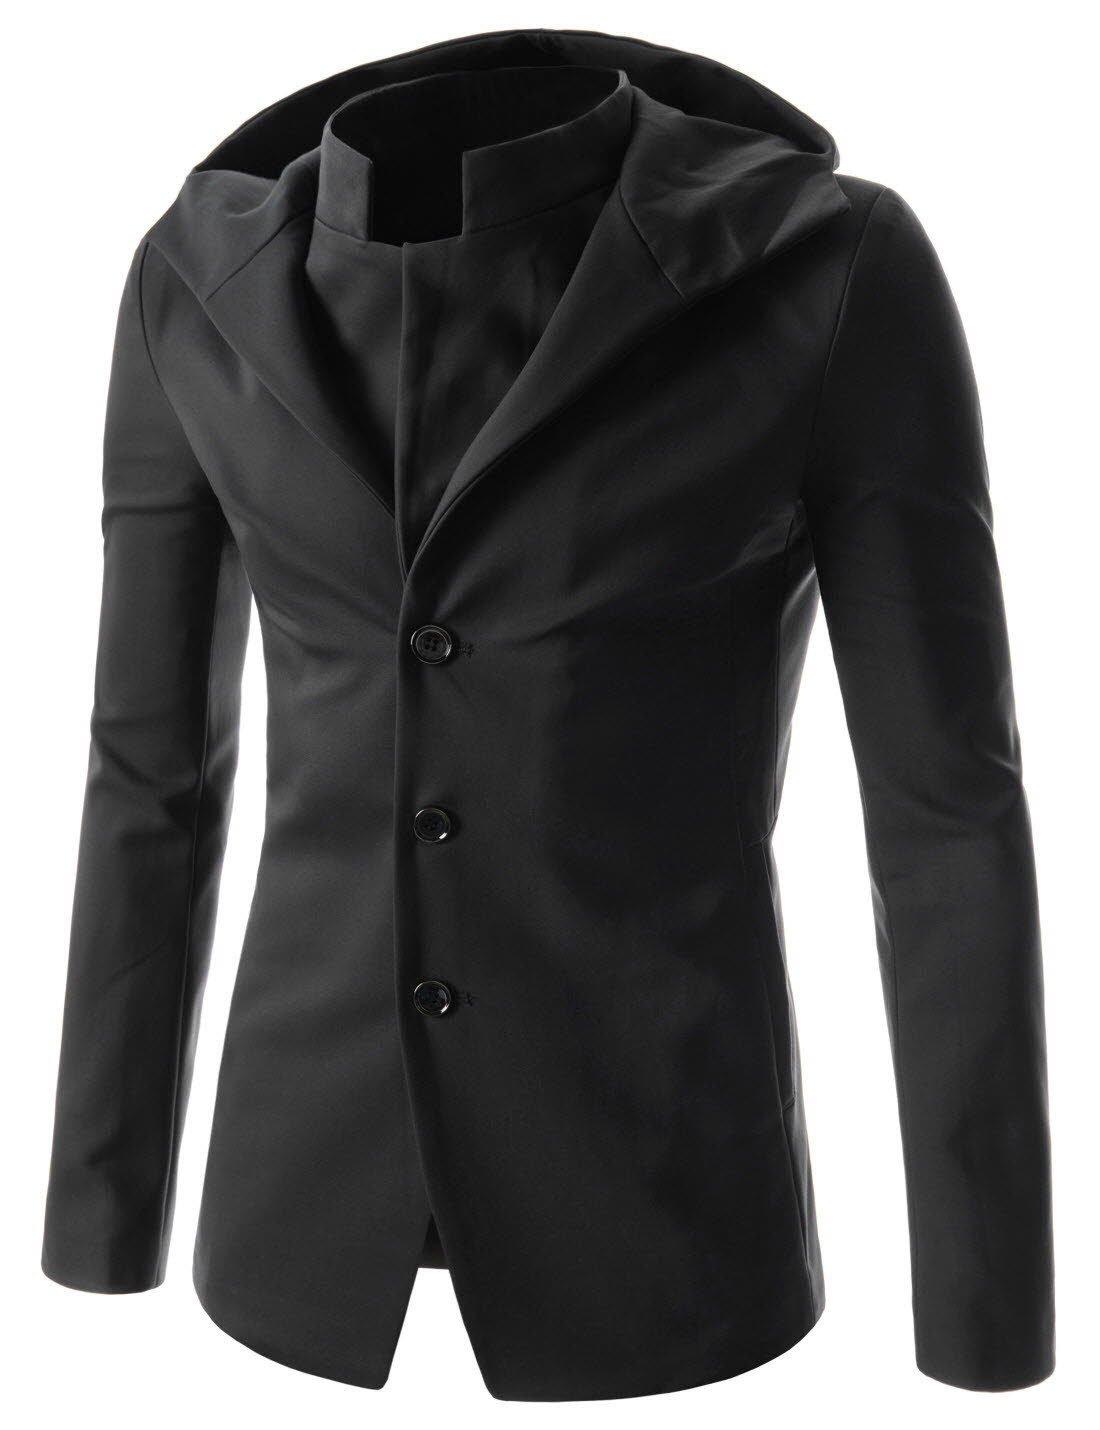 (NJK151) Mens Slim Fit Hooded Blazer Stylish Double Collar Sports Coat Jacket BLACK US XS(Tag size L)